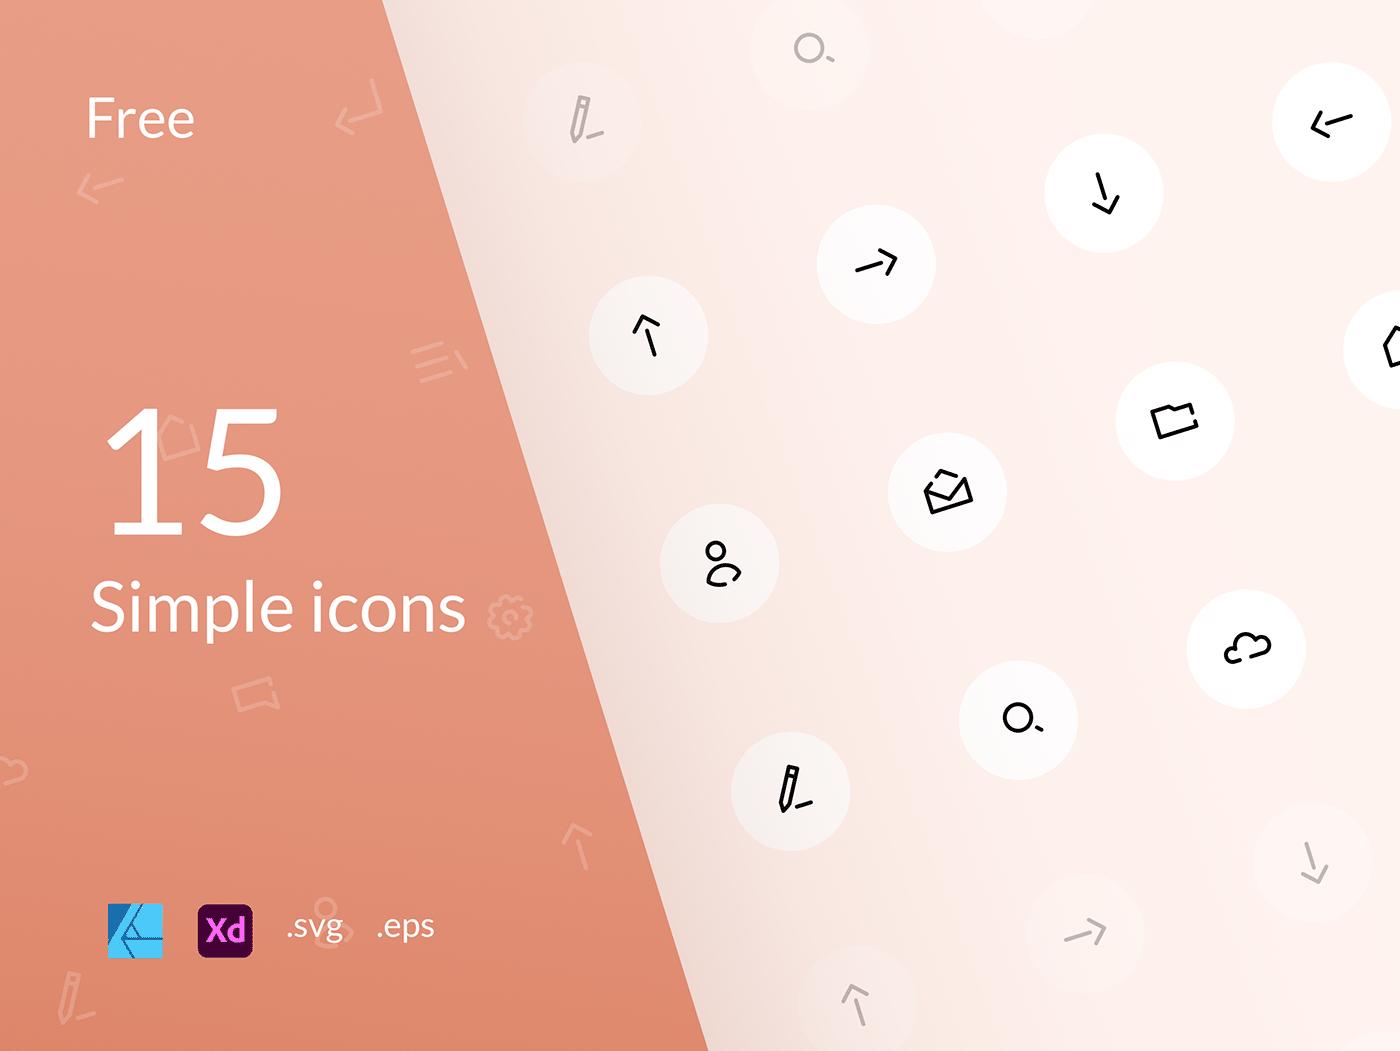 clean design free freebie icon set icons minimal UI vector